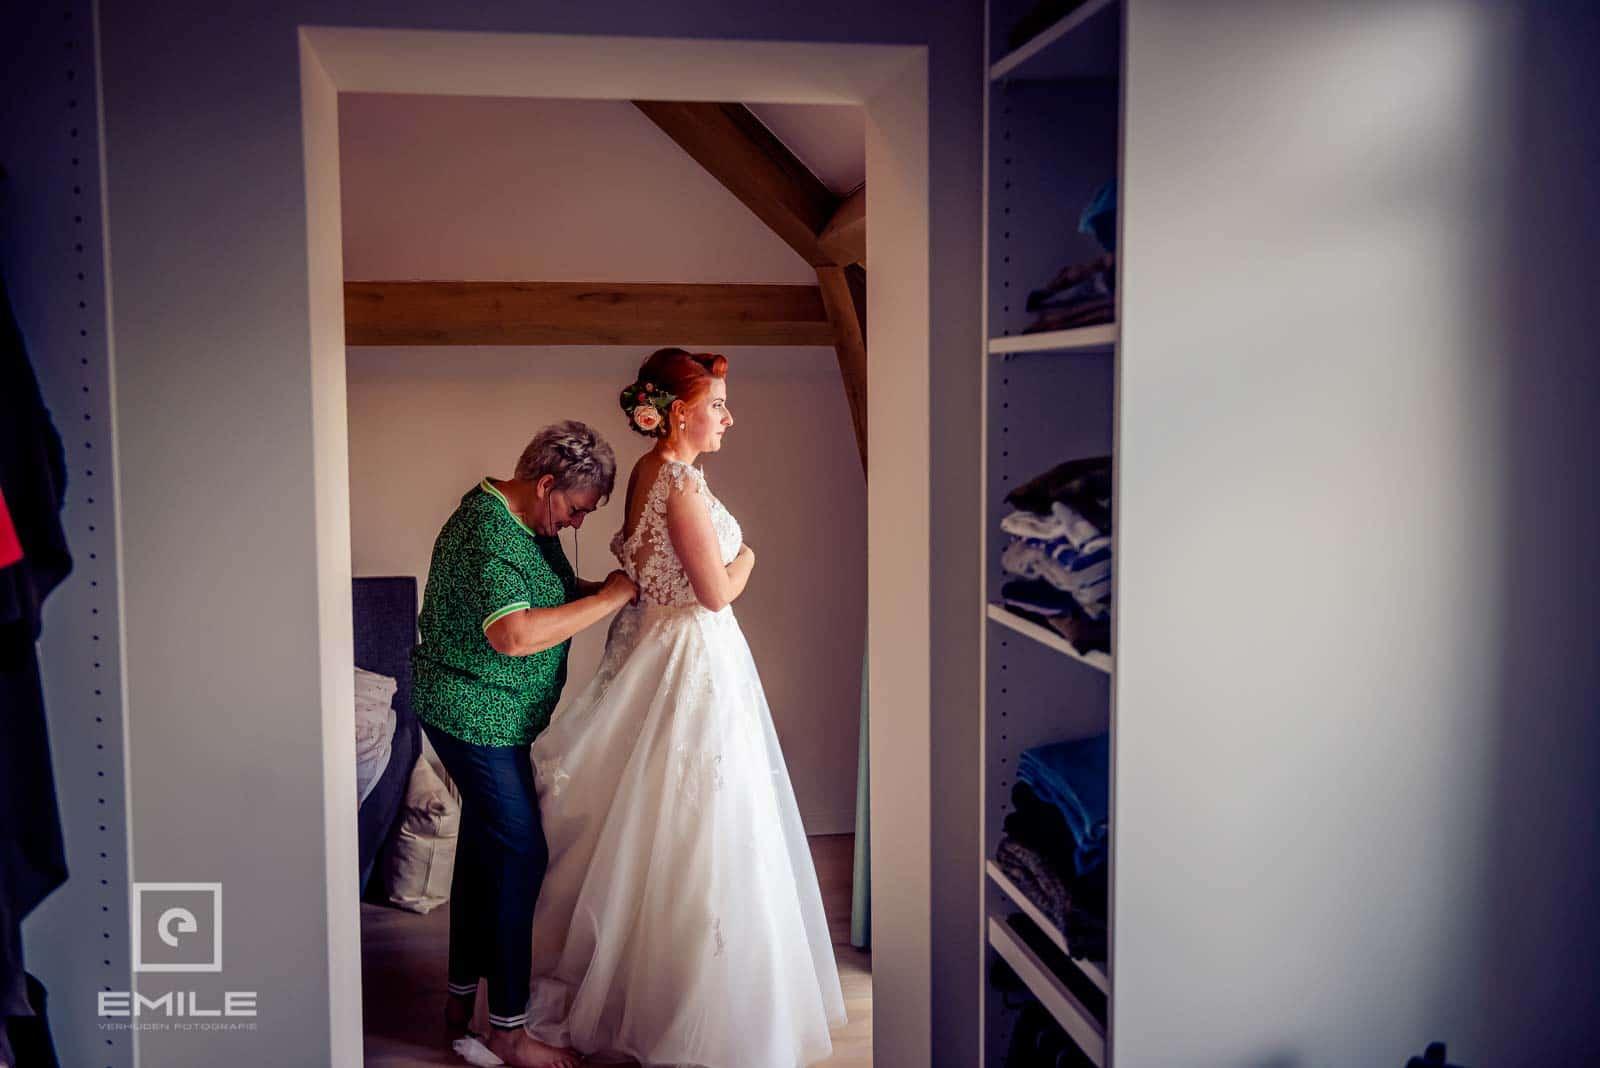 Moeder kleed bruid aan. Bruiloft Wylre Zuid-Limburg